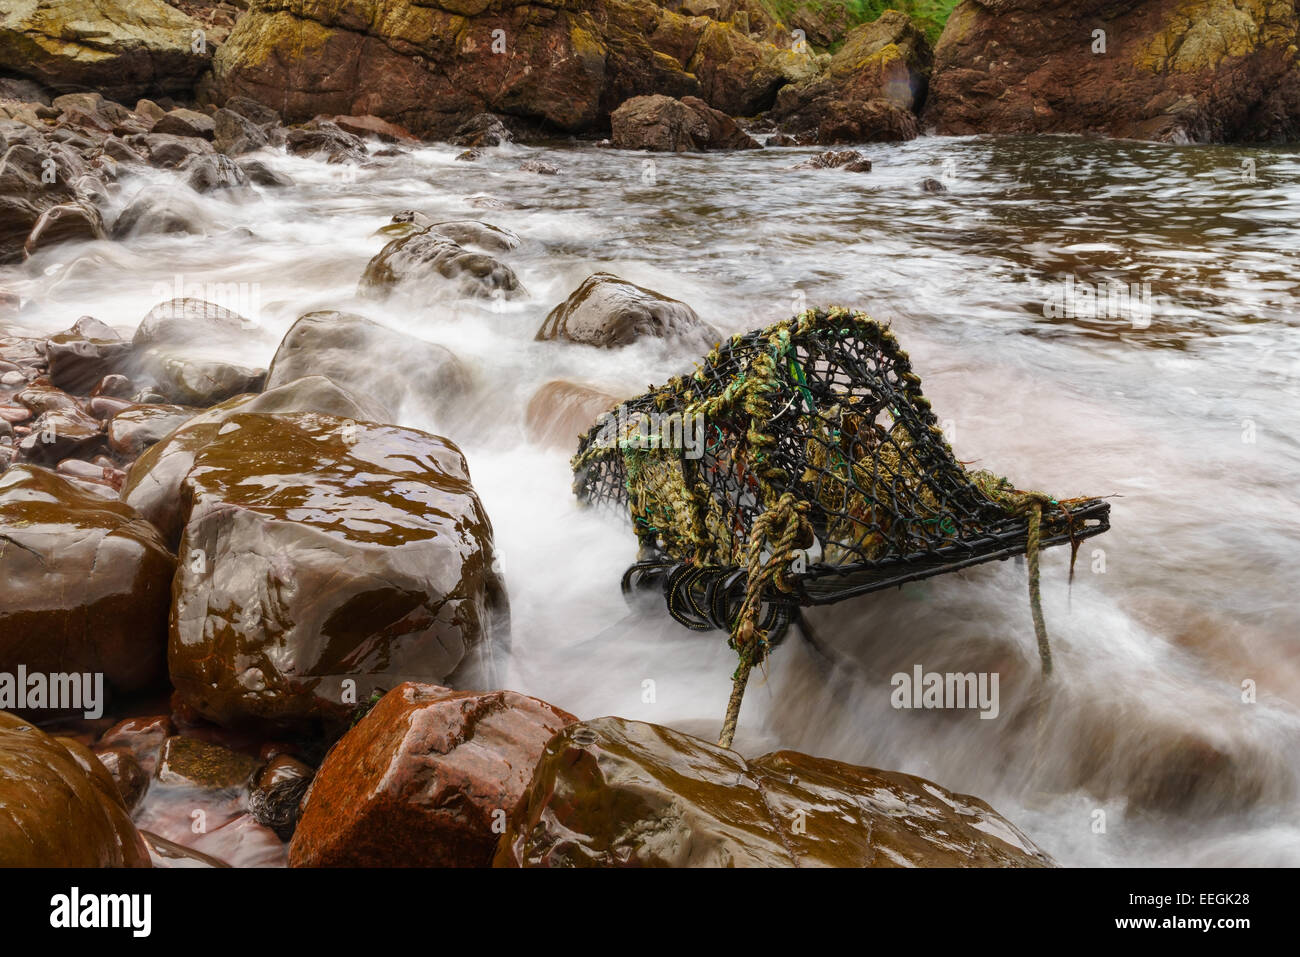 Creel Stock Photos & Creel Stock Images - Alamy